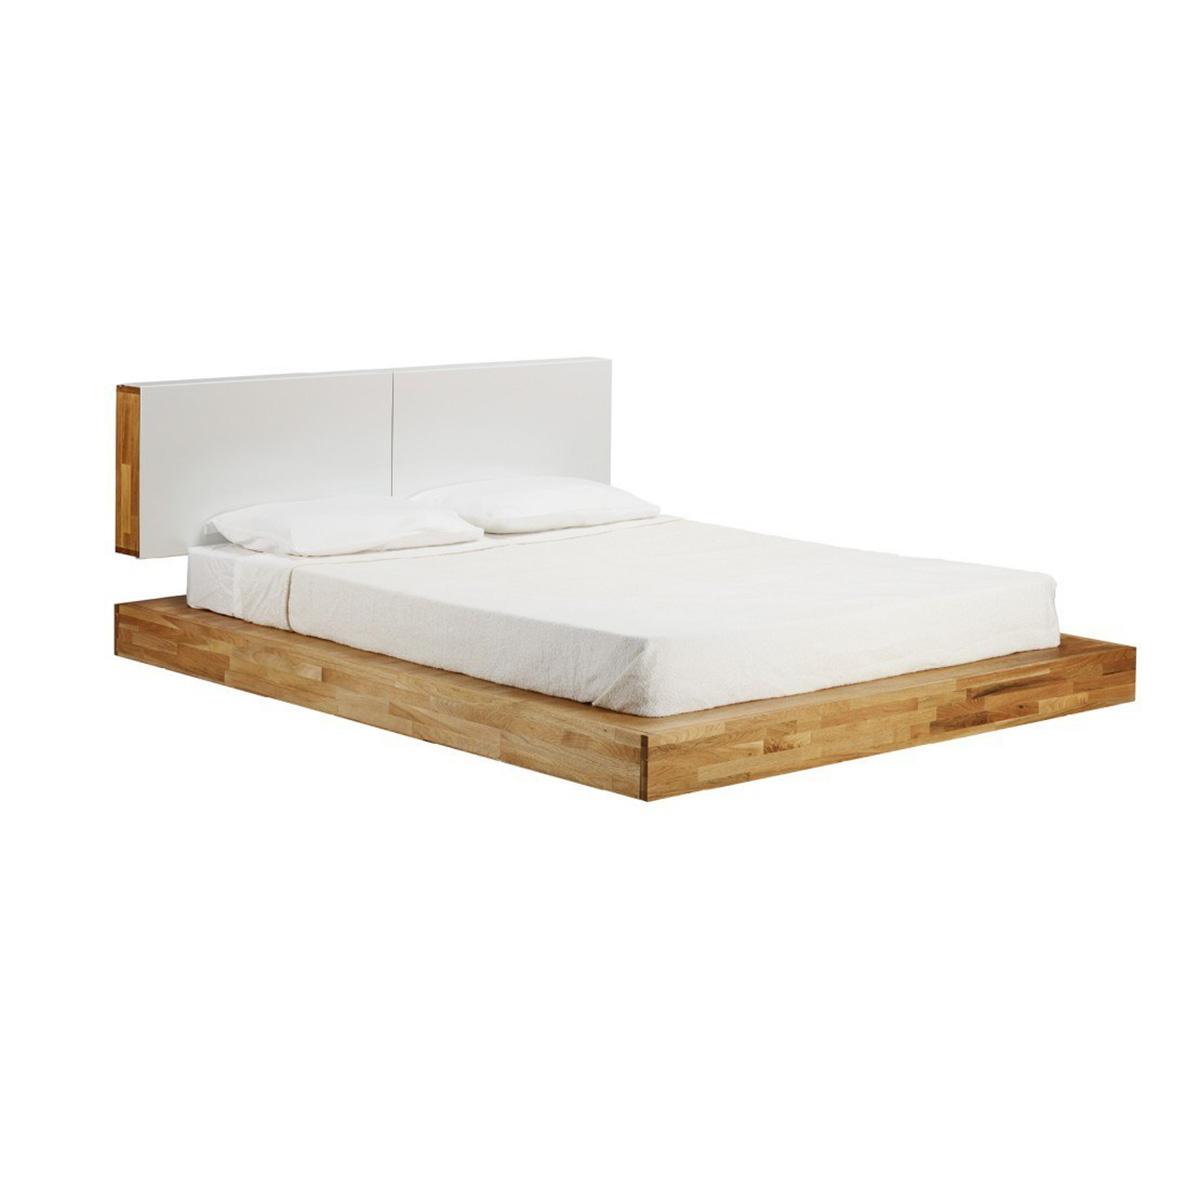 LAX Series Platform Bed